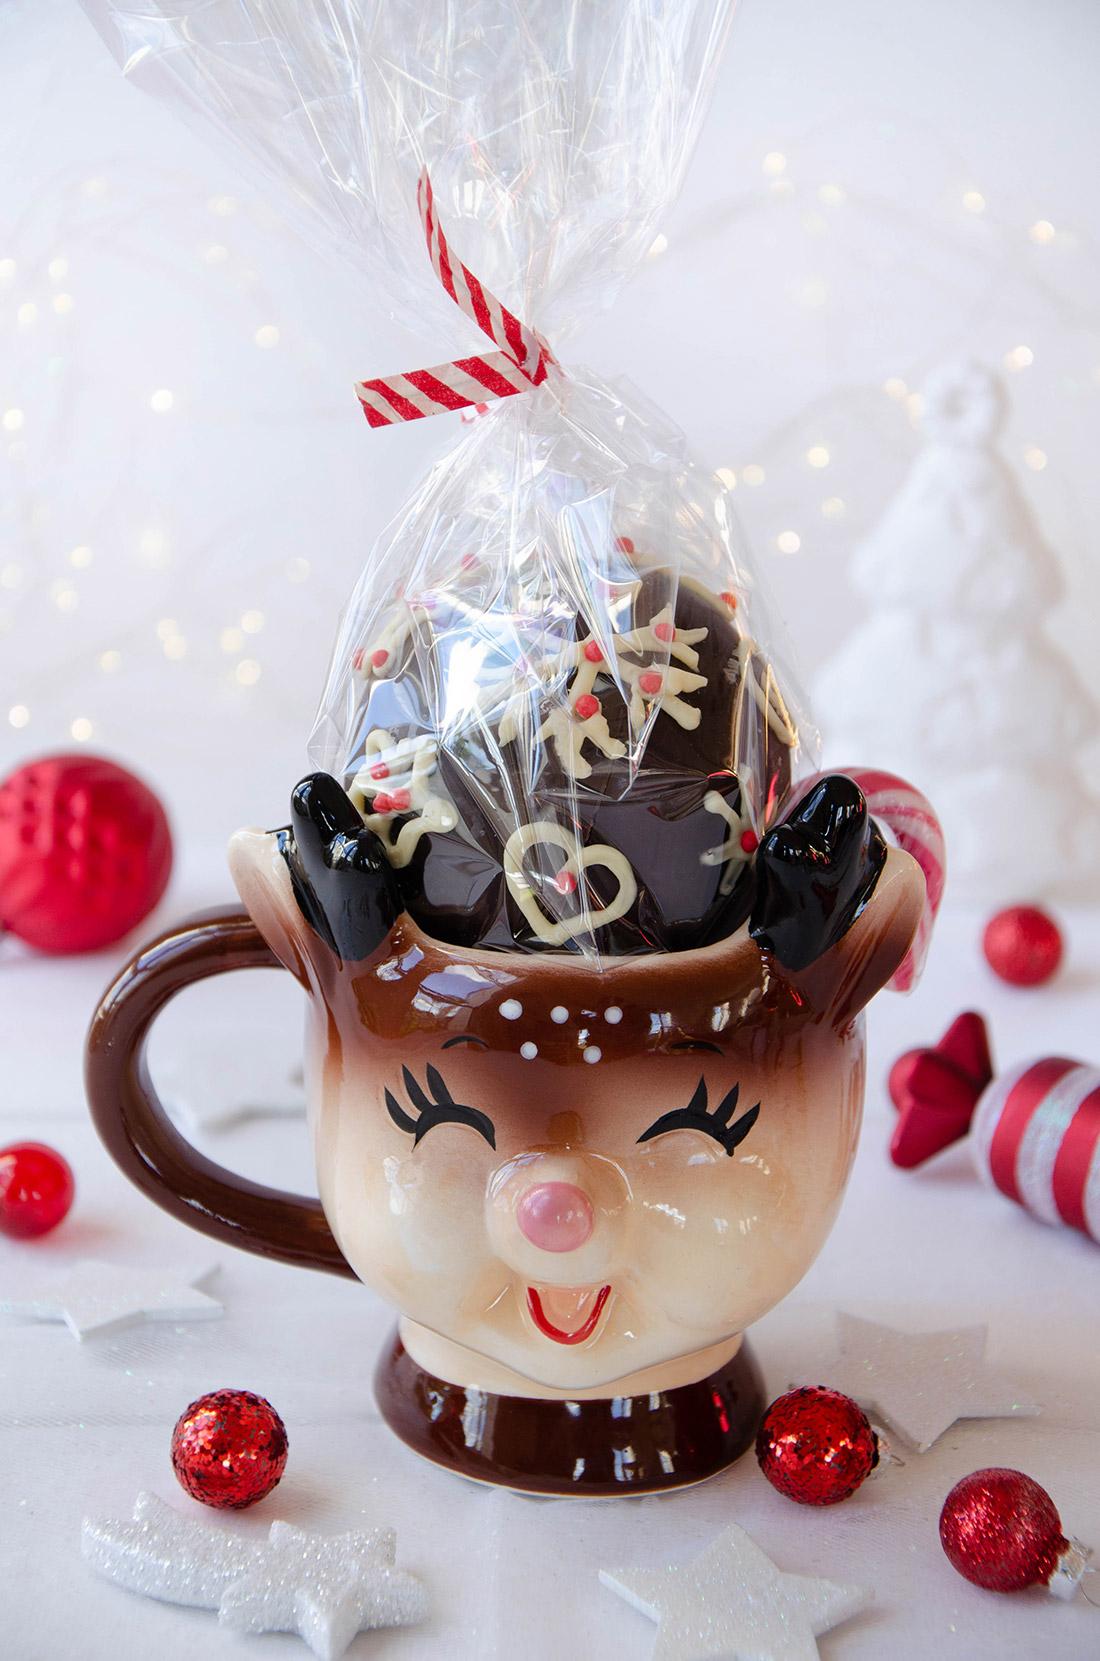 Recette de cadeau gourmand maison : hot chocolate bomb